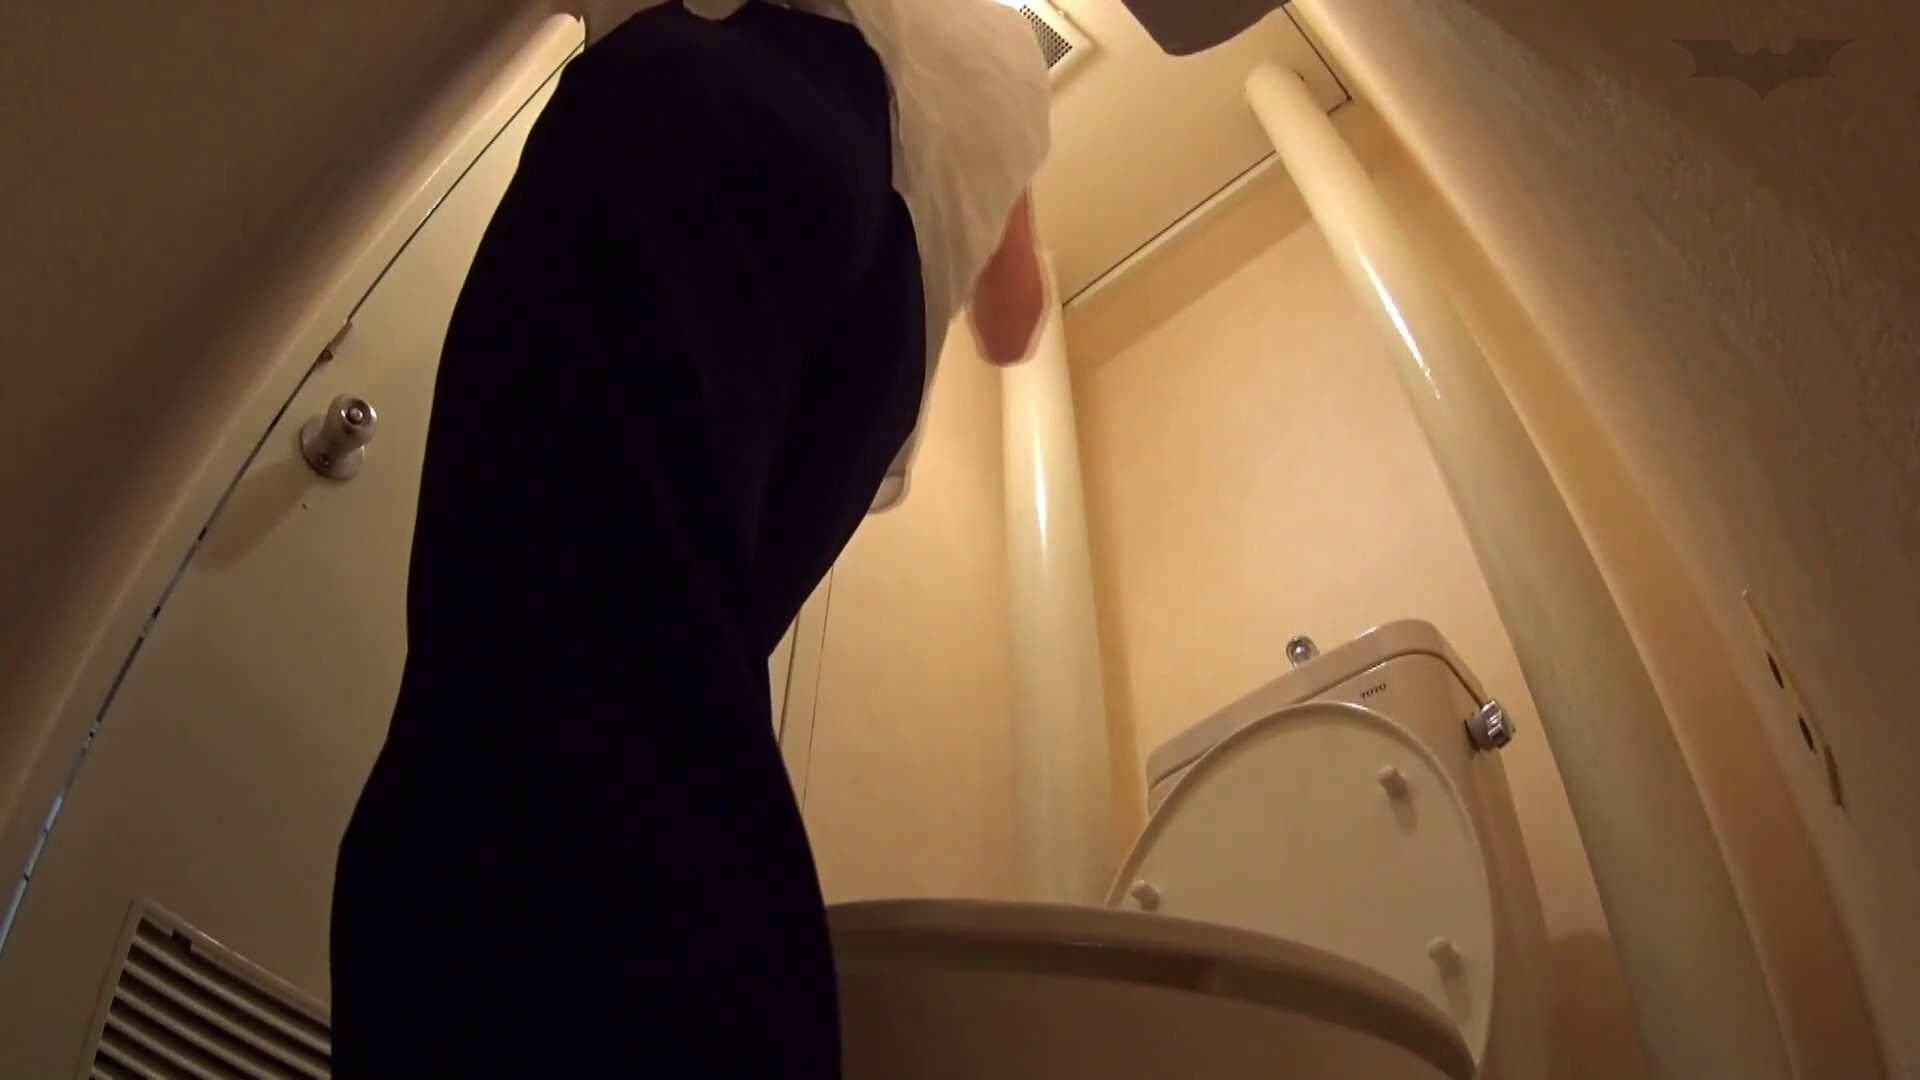 vol.04[洗面所]実はコレが目的でした。-脱糞美人お女市さまと巨乳大学生- 巨乳 エロ画像 103pic 87